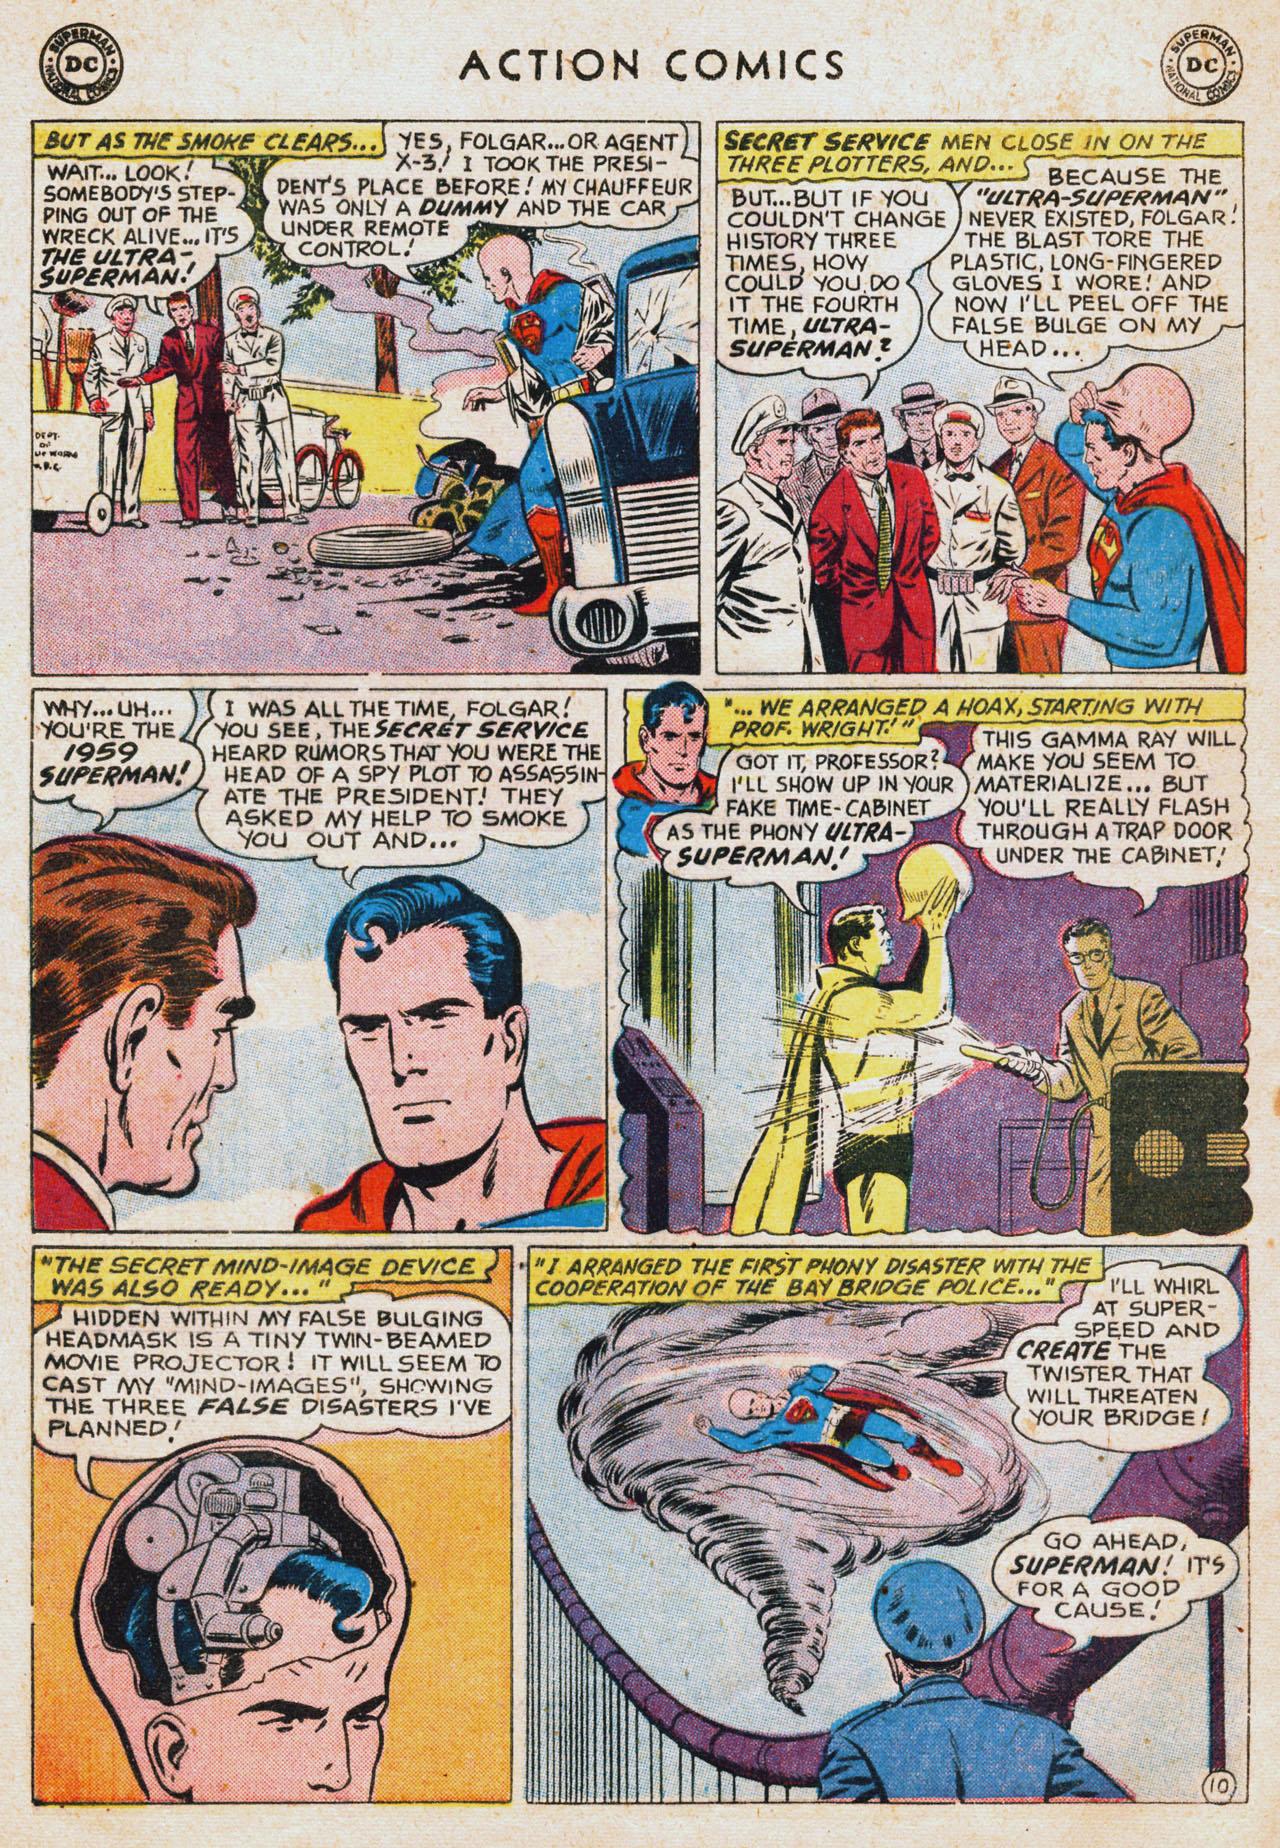 Action Comics (1938) 256 Page 11